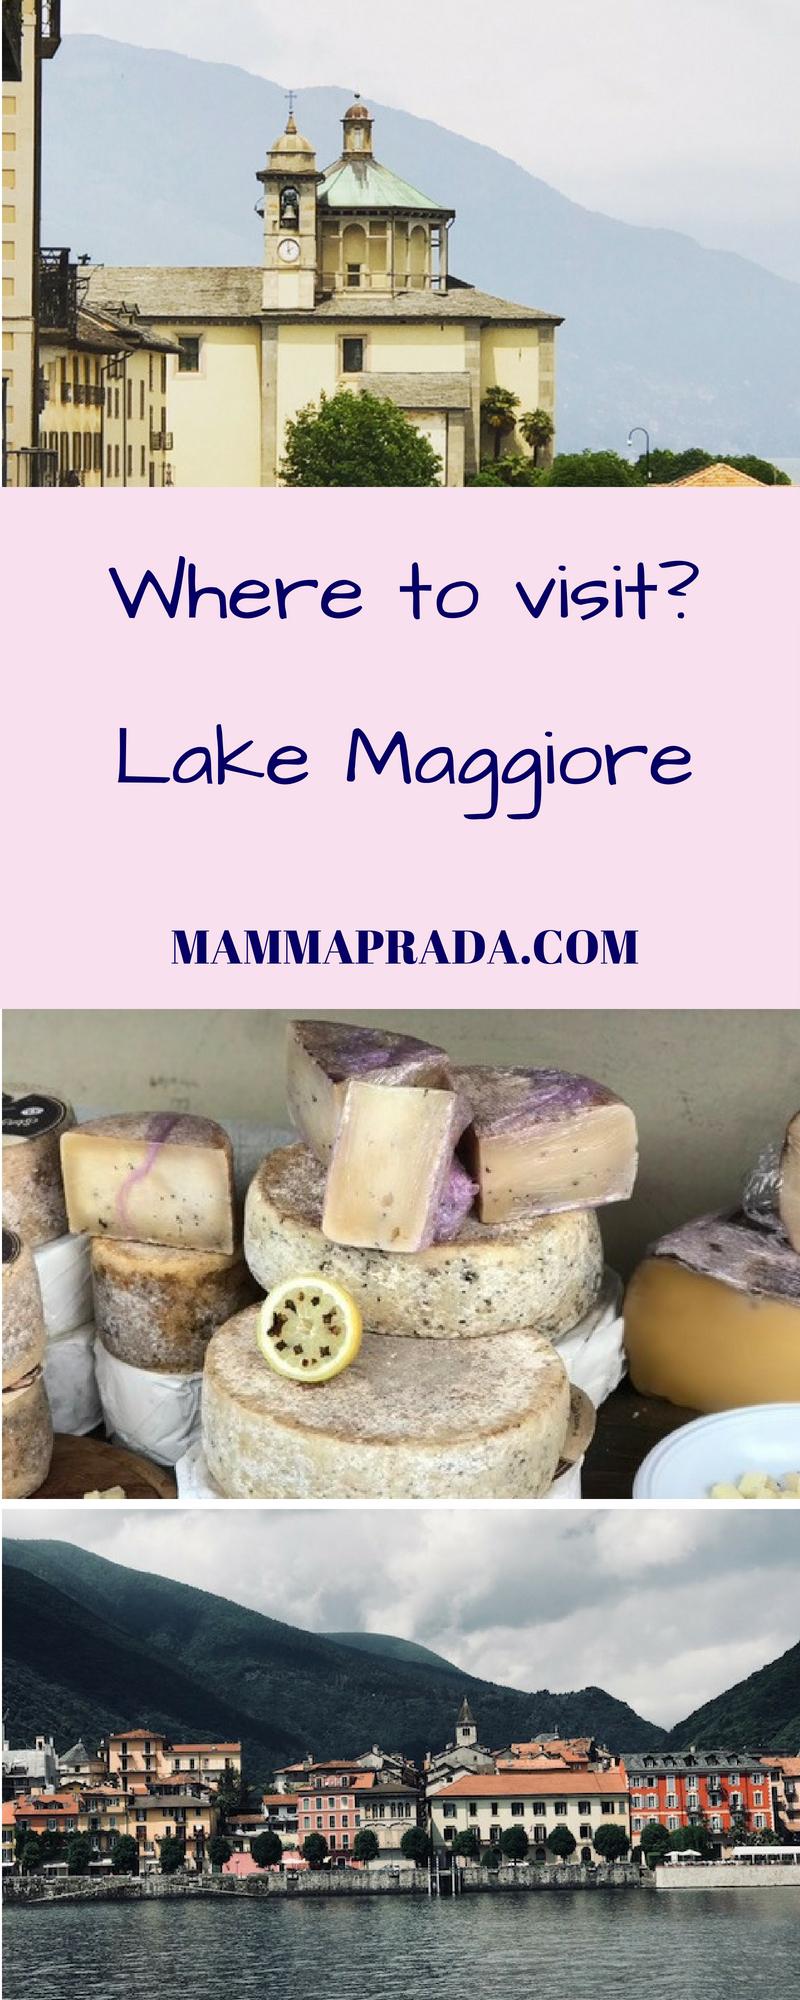 Mammaprada Italian Travel and Bilingual Parenting Blog | Where to visit? Lake Maggiore